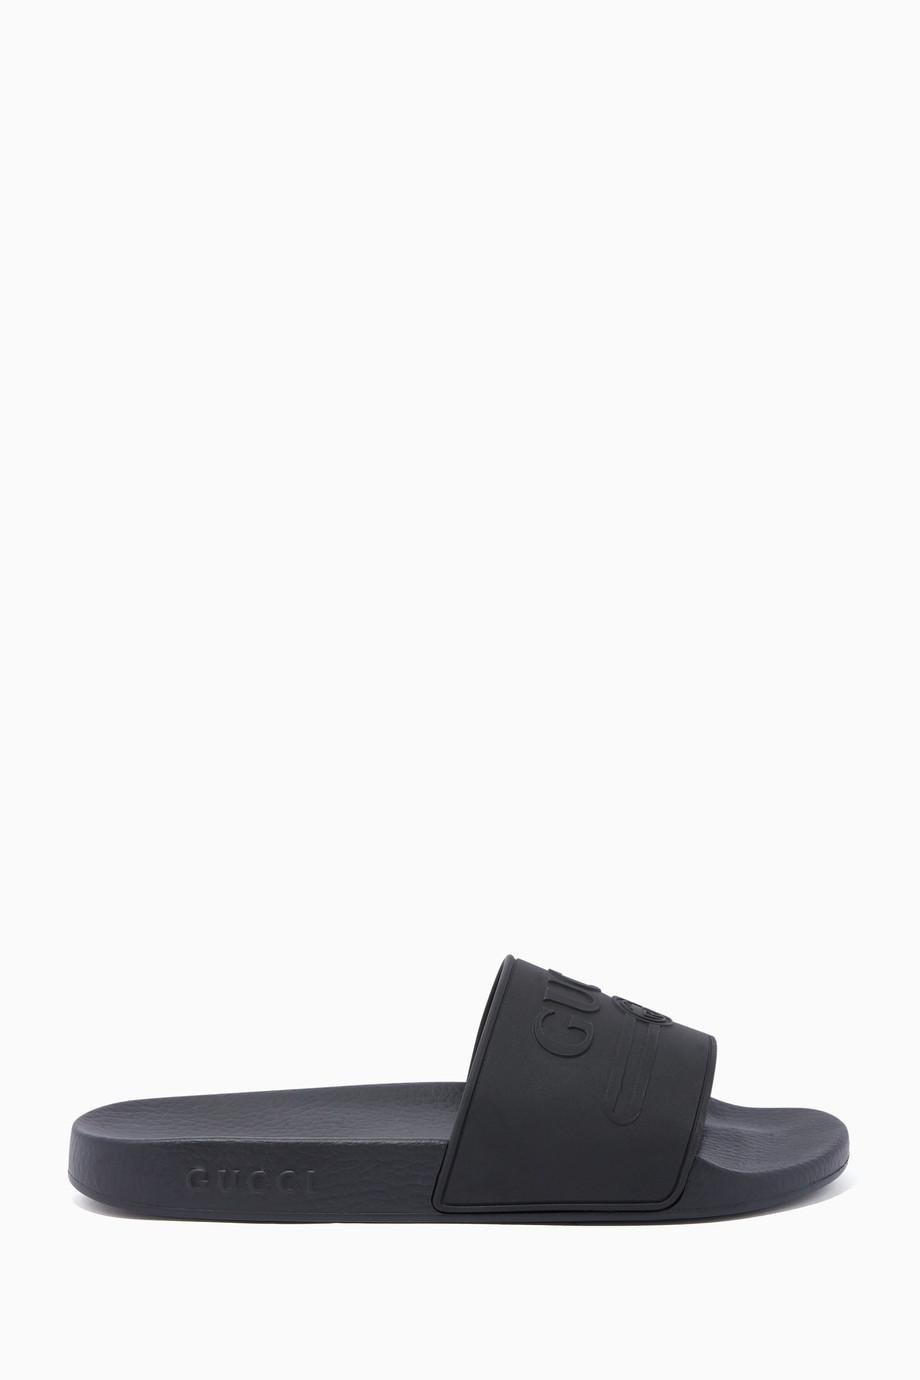 7554f287f Shop Gucci Black Black Tonal Logo Pursuit Slide Sandals for Men ...